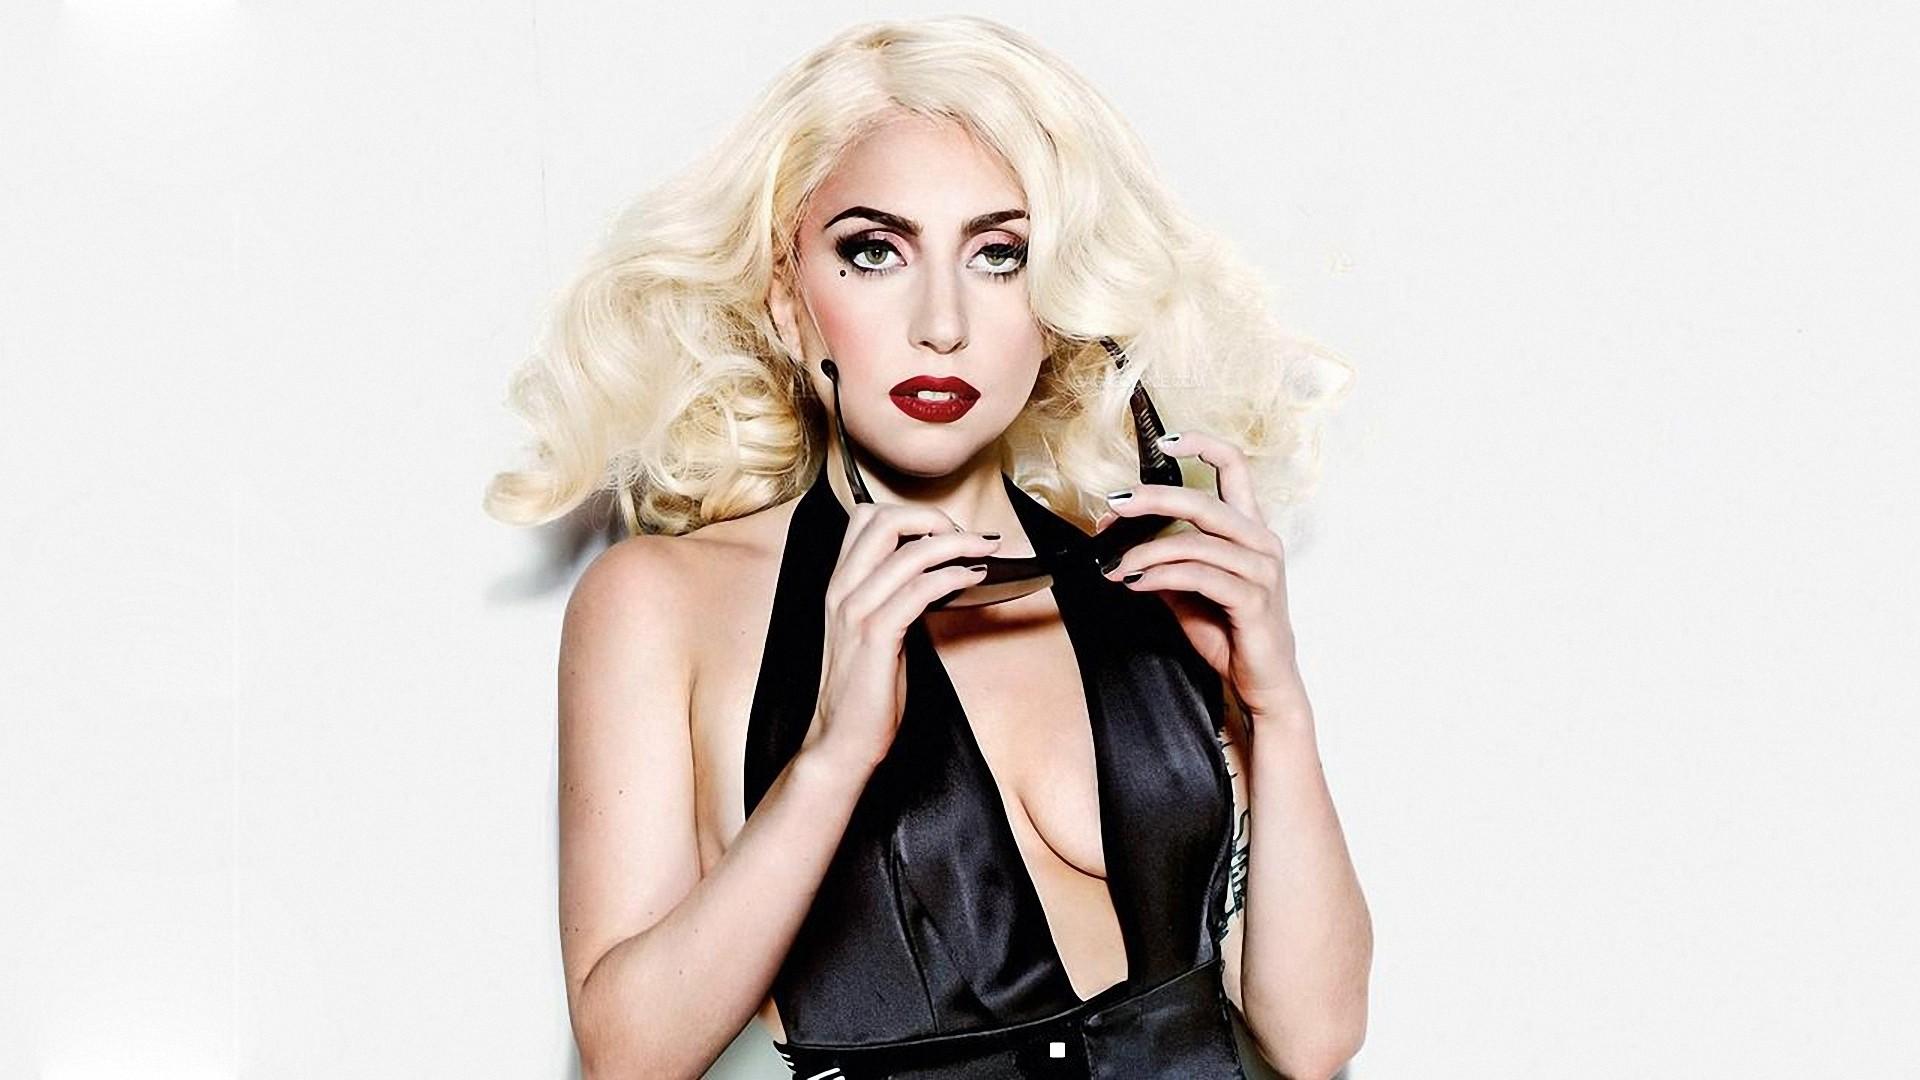 Леди Гага продемонстрировала стройную фигуру-320x180